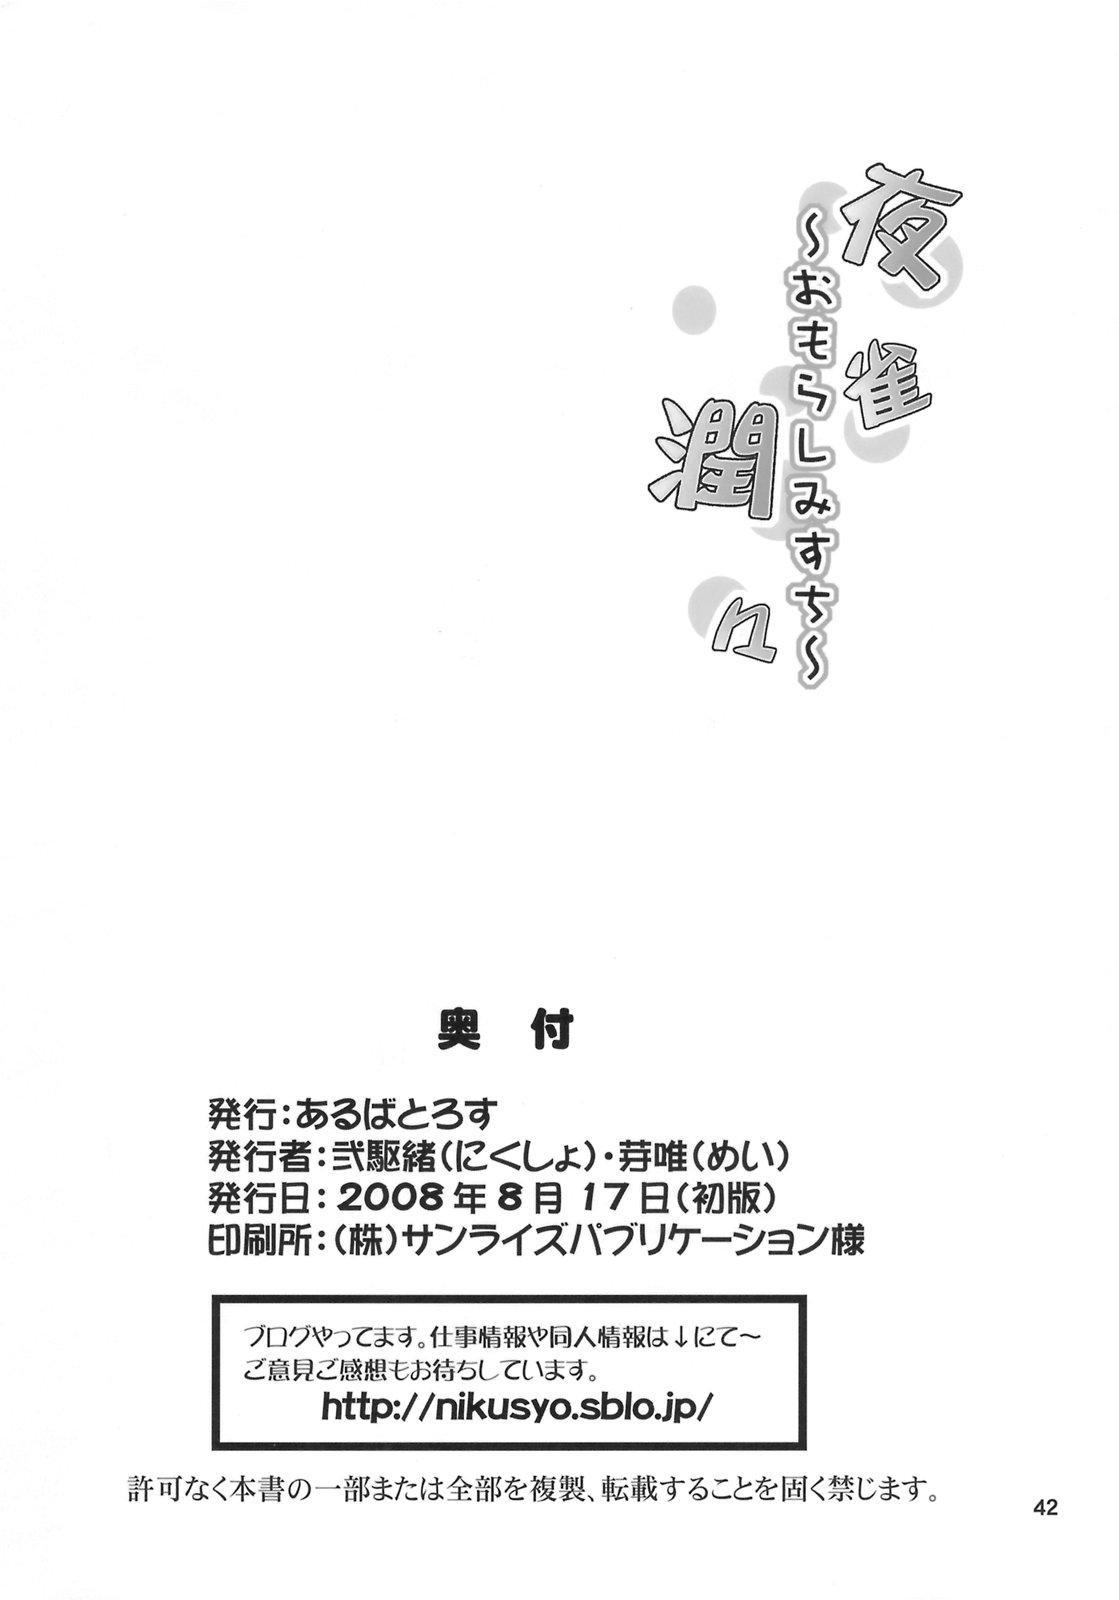 Yosuzume Junjun 41